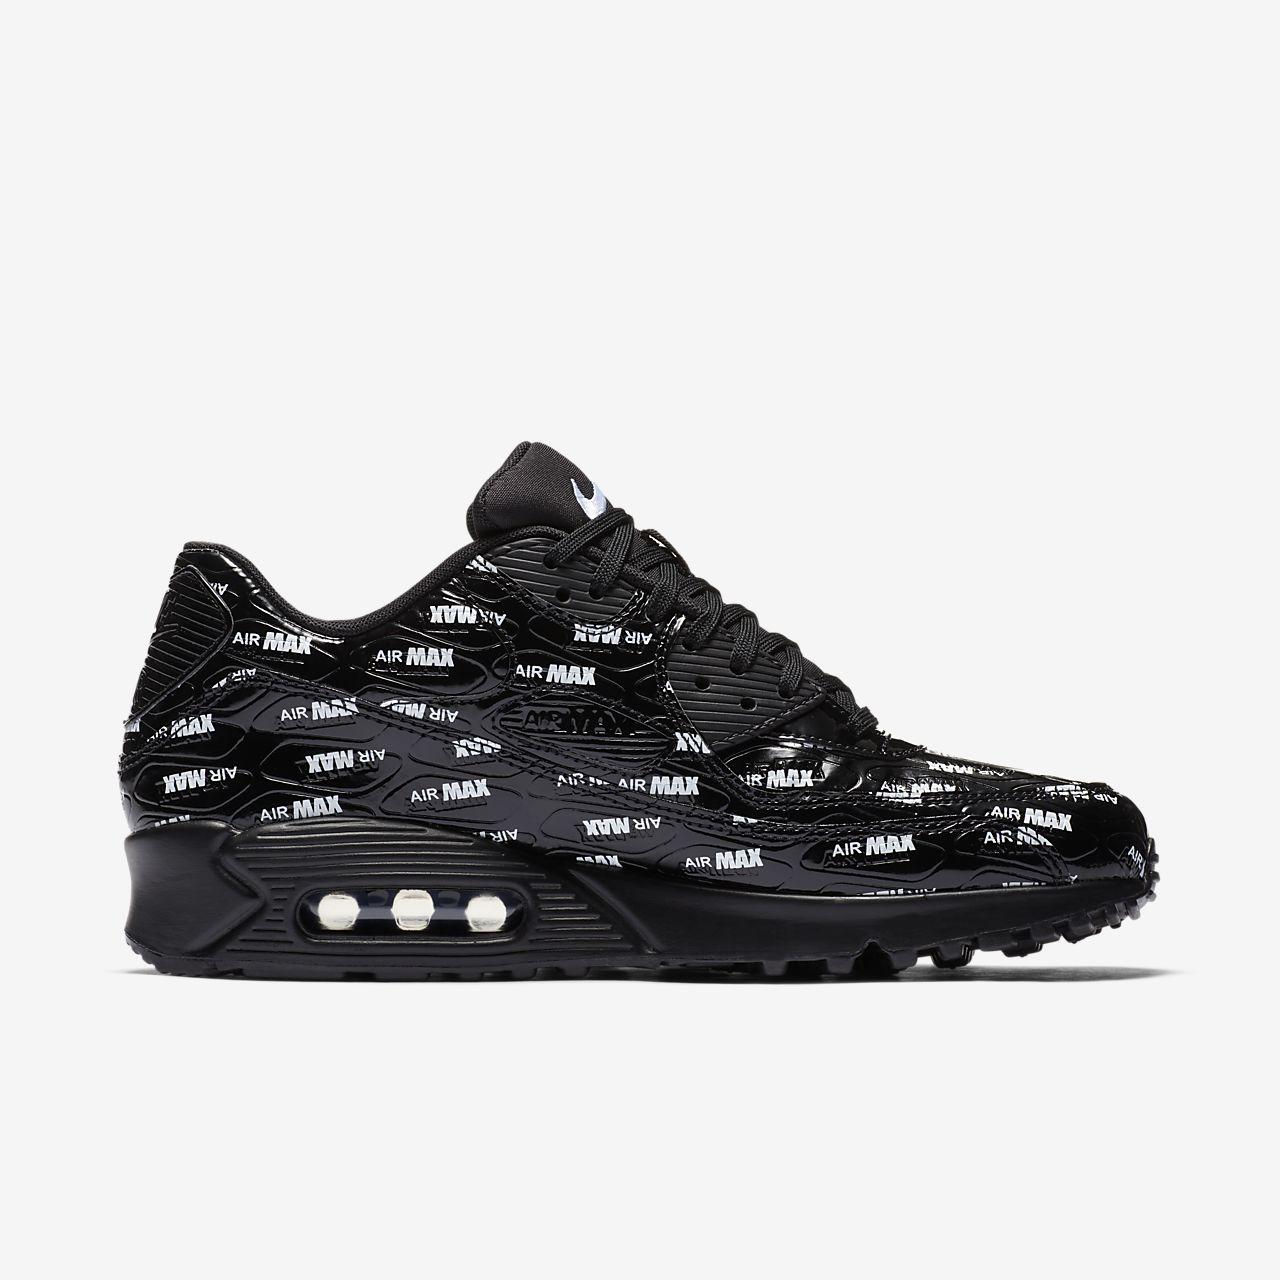 separation shoes 7fab3 1affe ... Chaussure Nike Air Max 90 Premium pour Homme